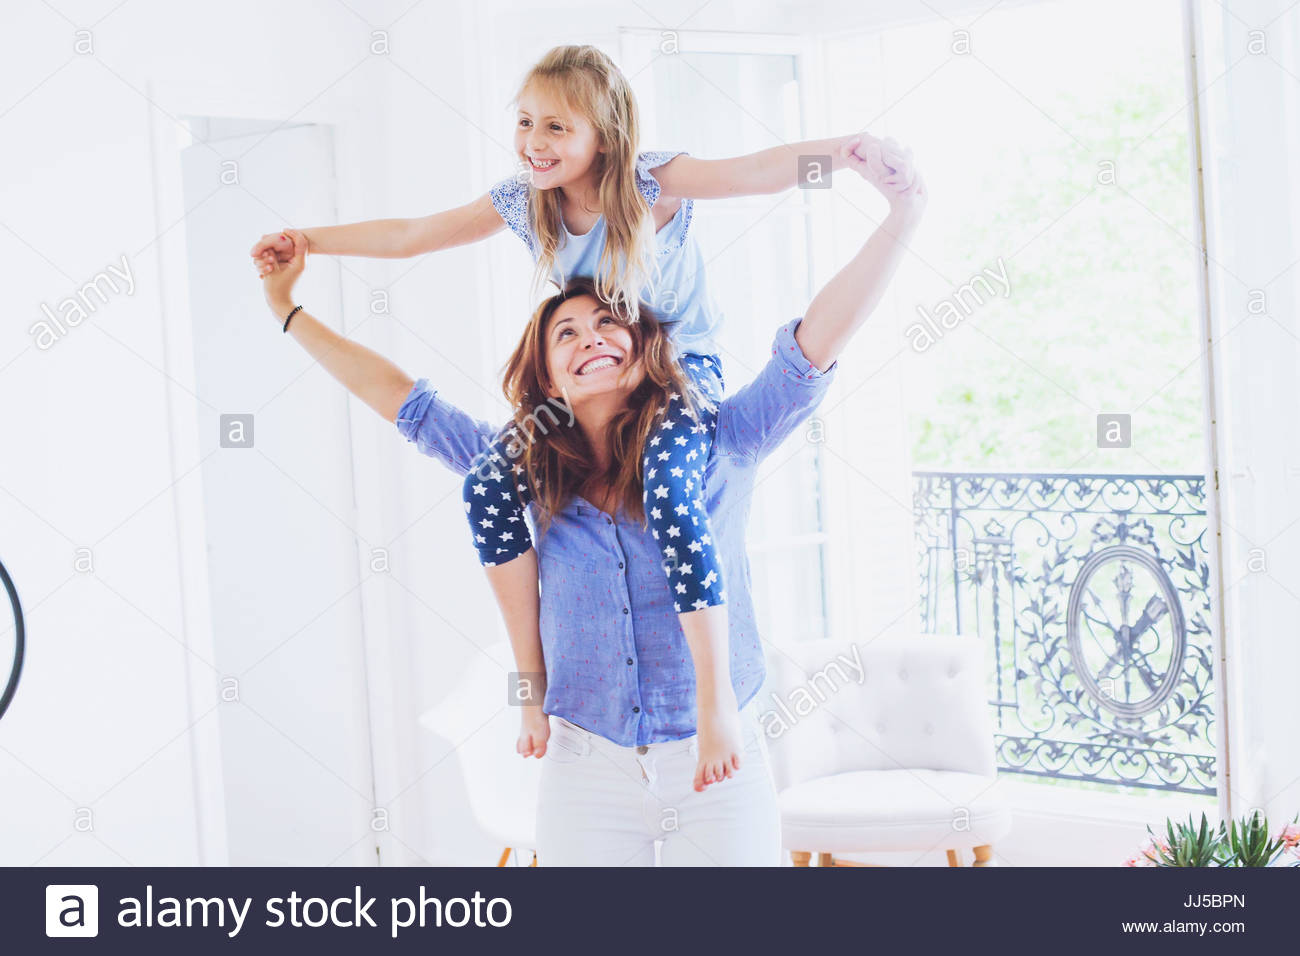 Madre e hija divirtiéndonos juntos en casa, sonriente retrato de familia caucásica Imagen De Stock